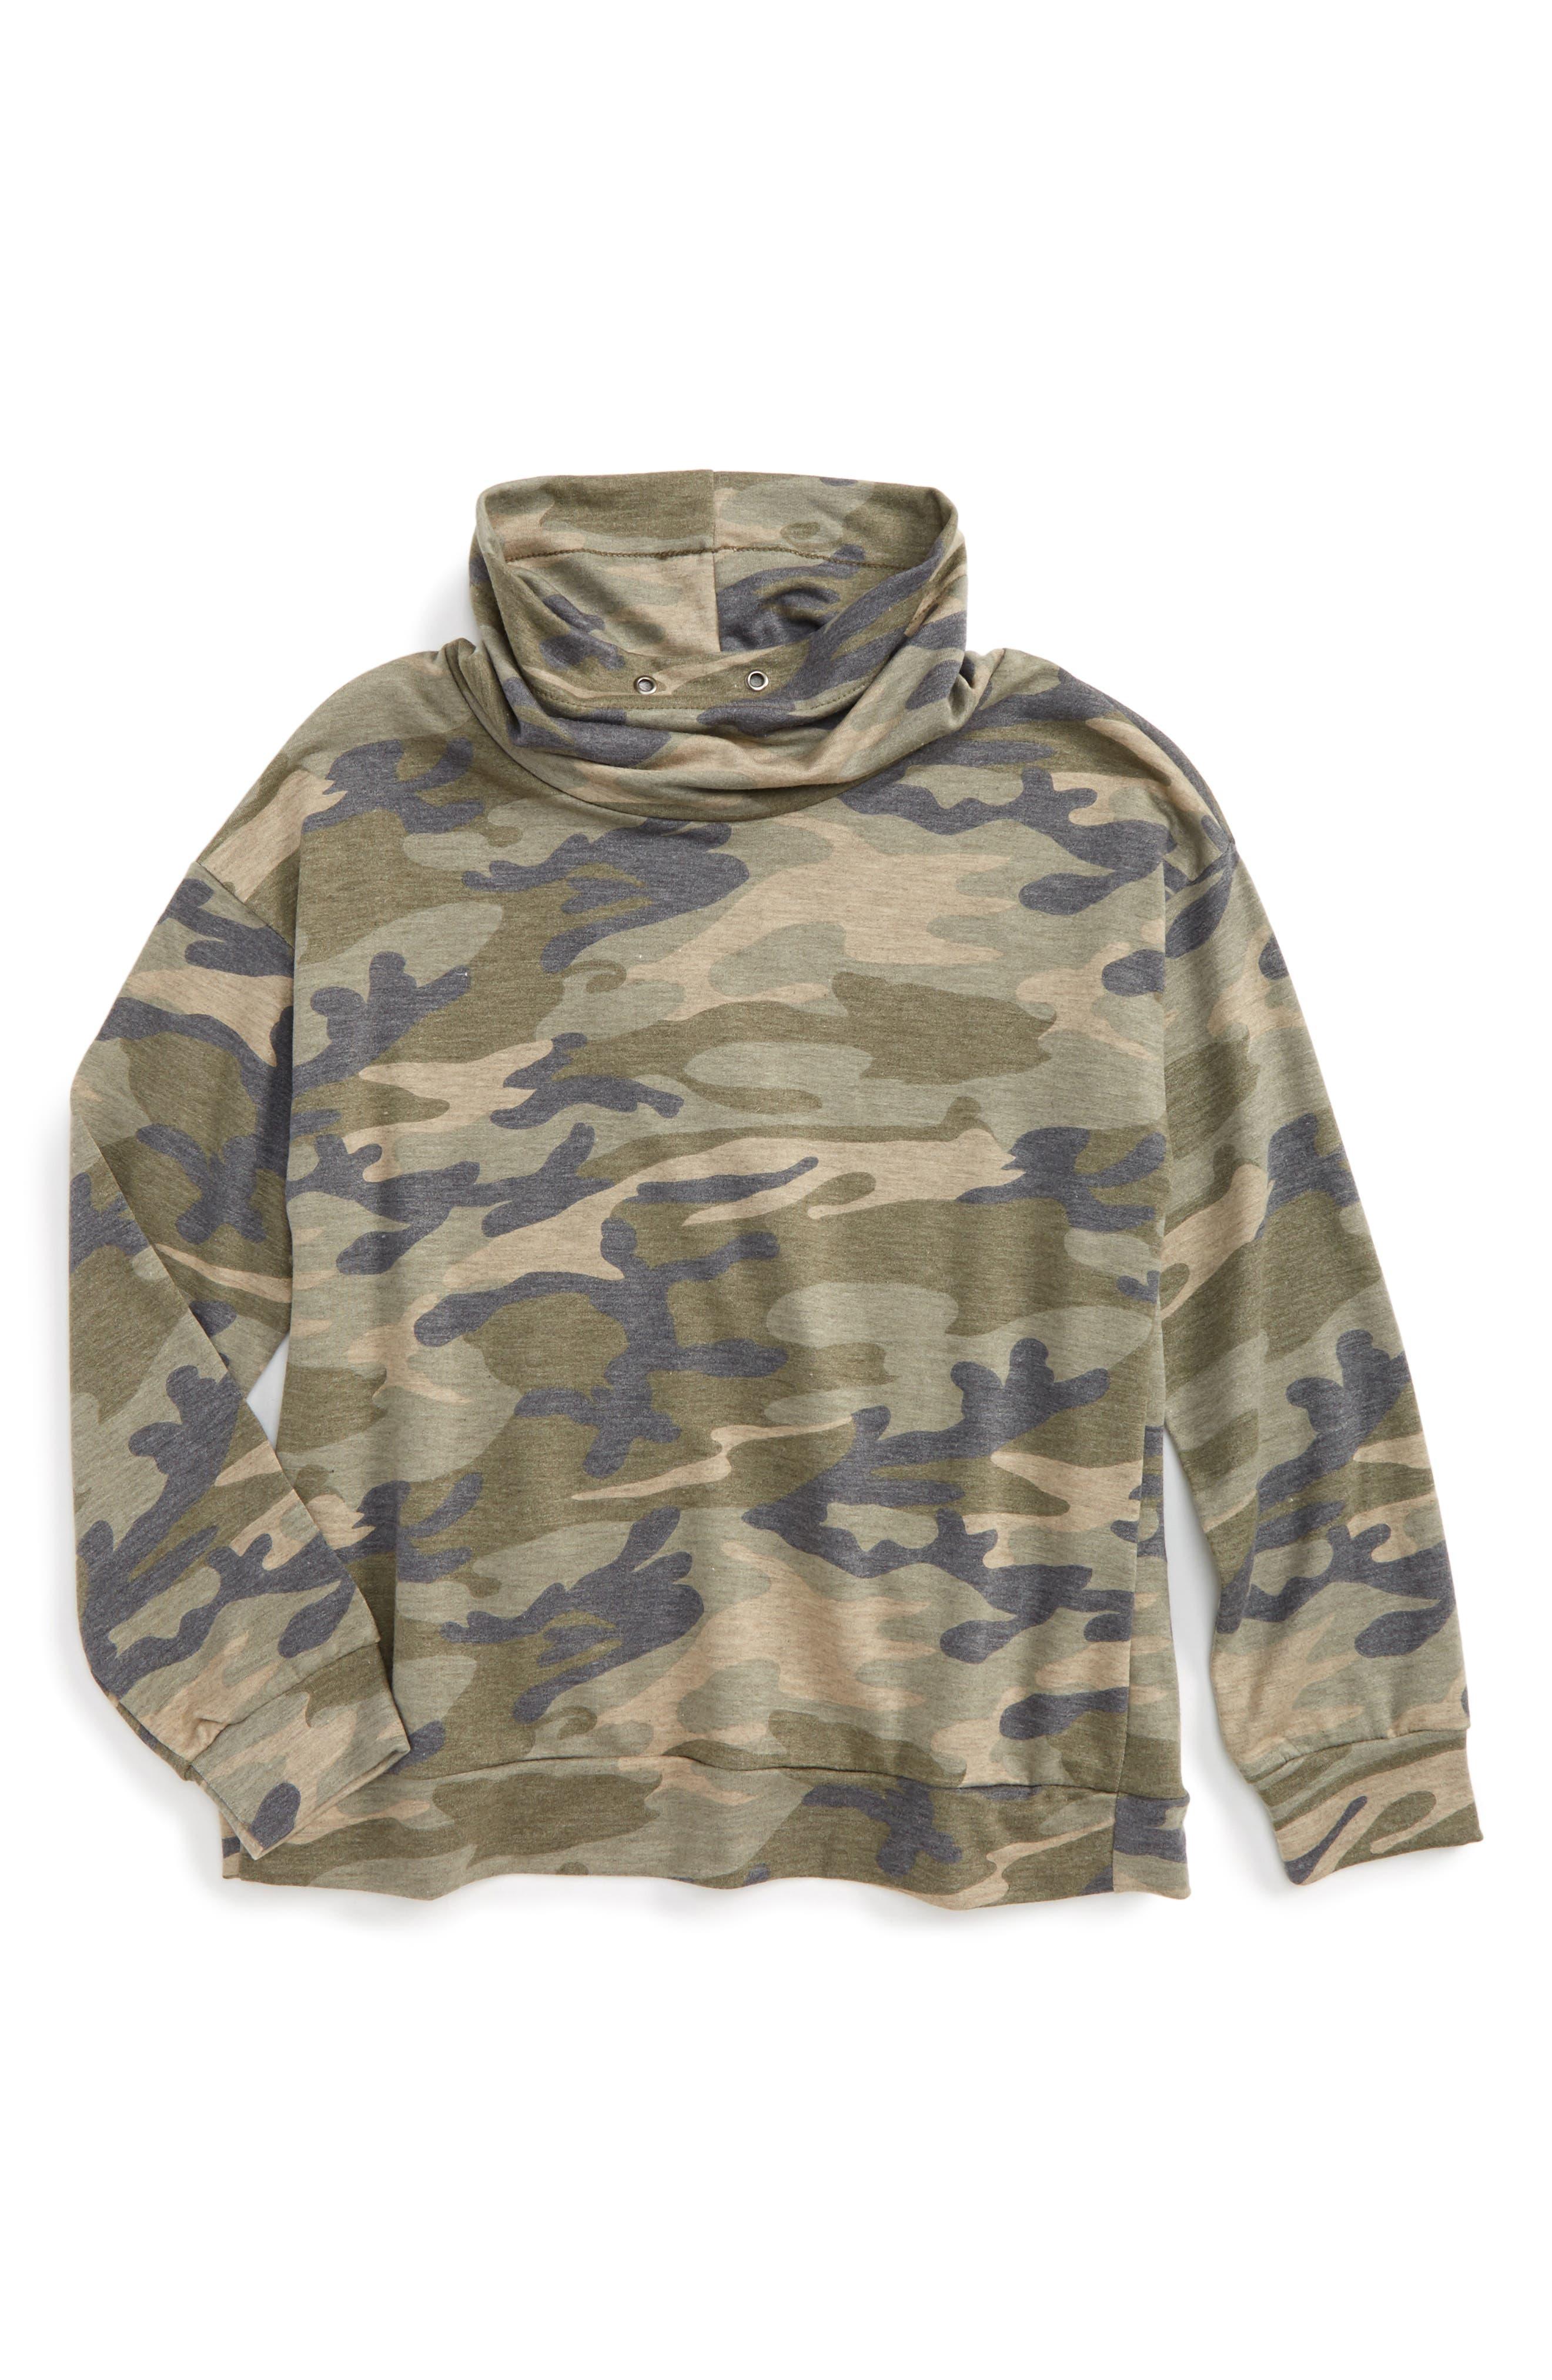 Camo Print Cowl Neck Sweatshirt,                         Main,                         color, 073 Military